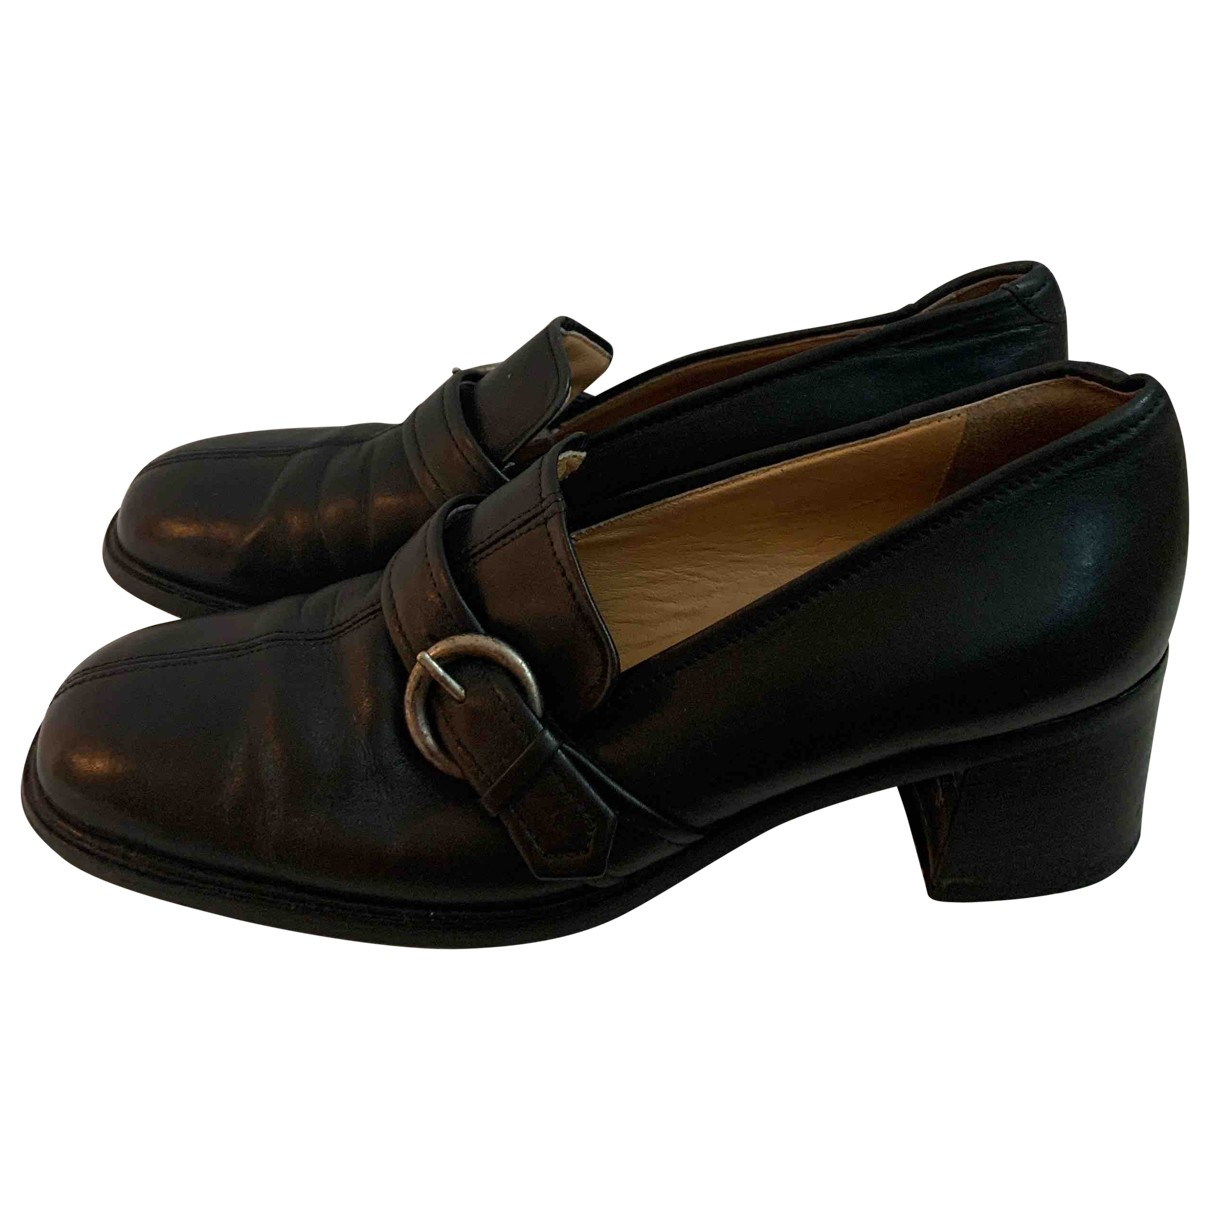 Coach \N Black Leather Heels for Women 8 US